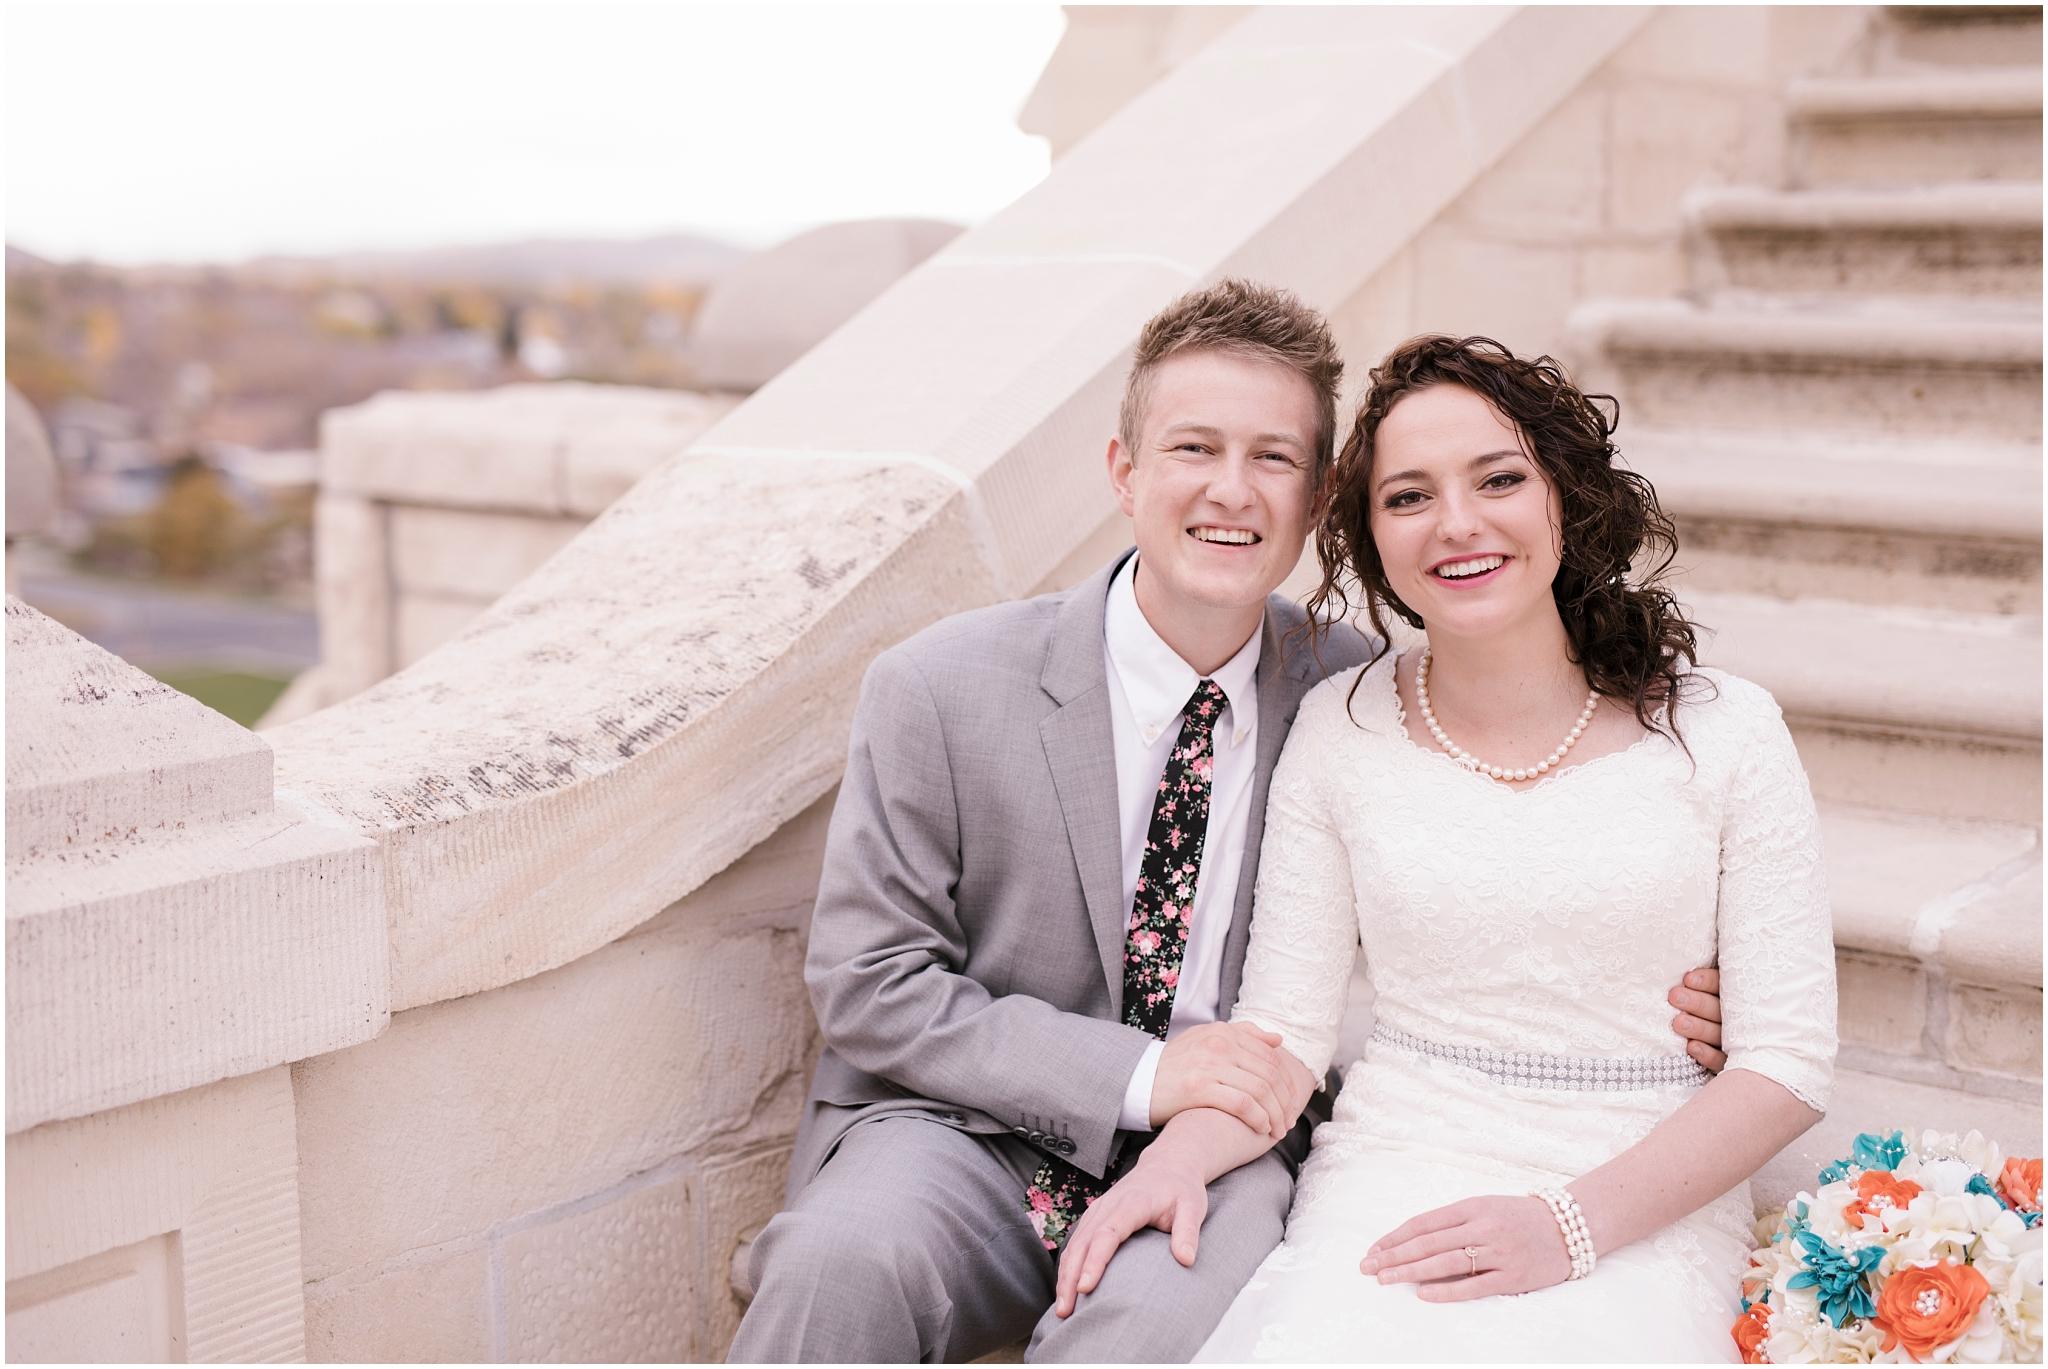 BA-Bridals-120_Lizzie-B-Imagery-Utah-Wedding-Photographer-Central-Utah-Photographer-Utah-County-Manti-Utah-Temple.jpg